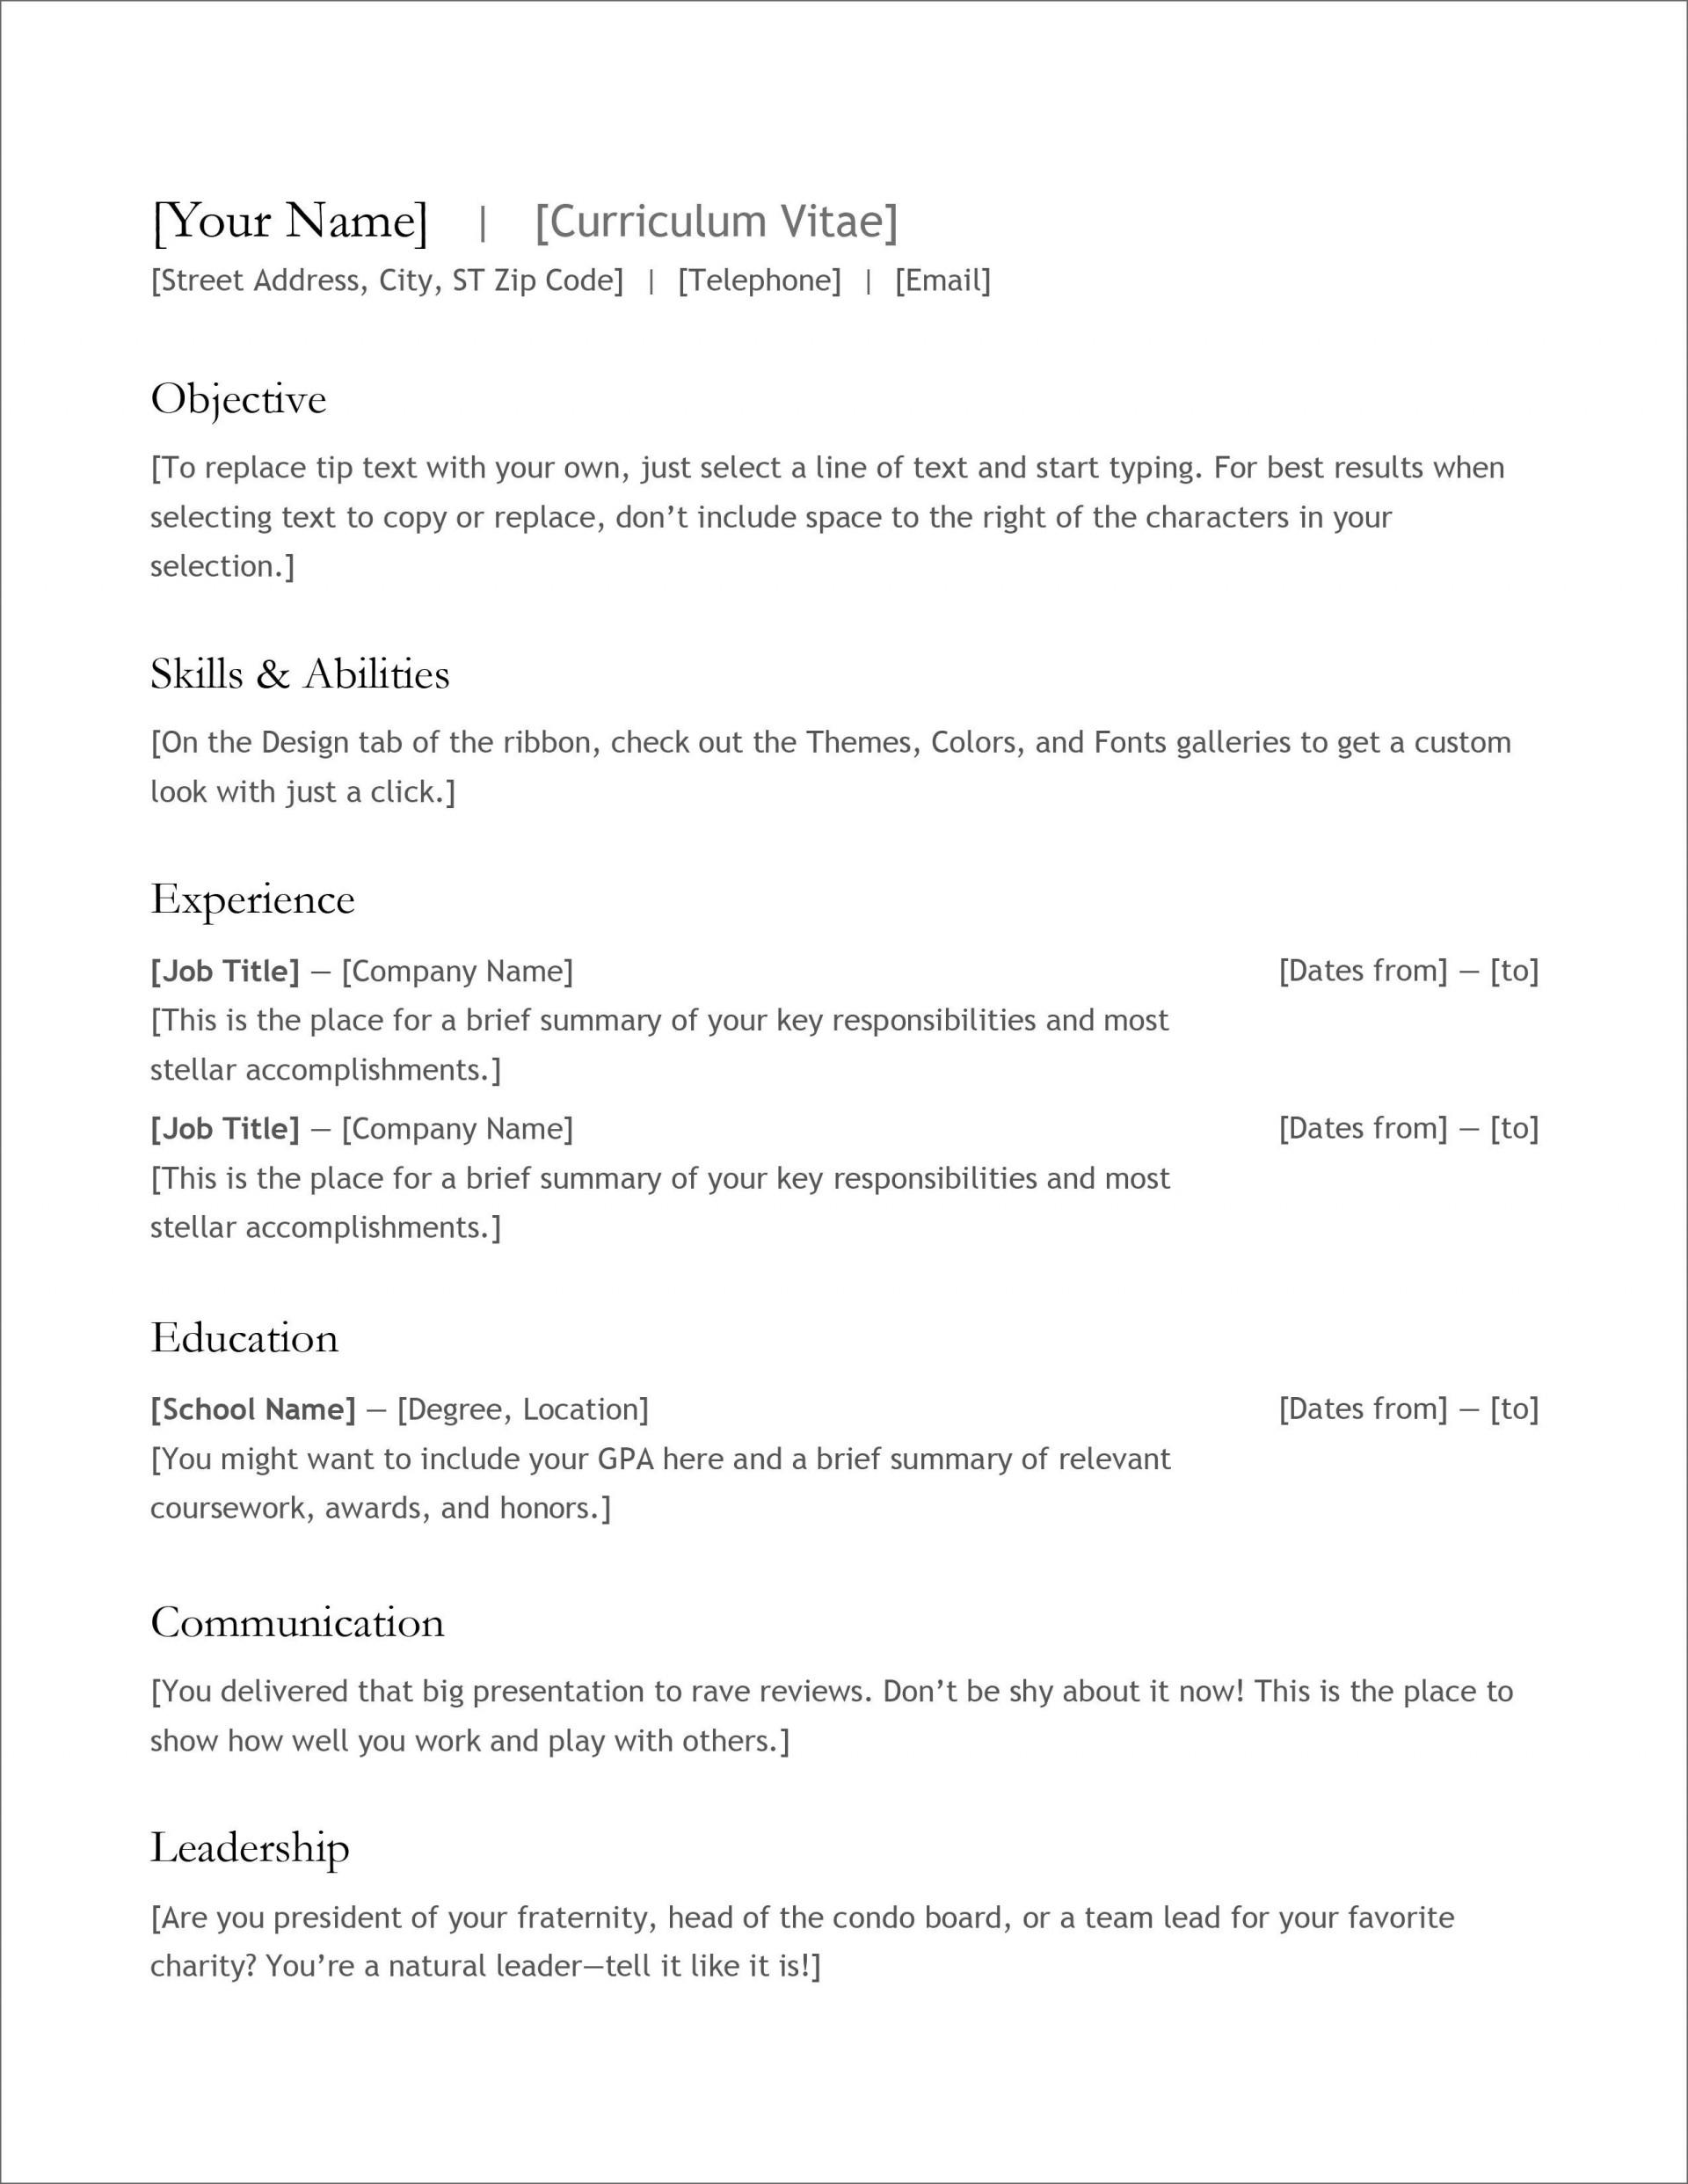 007 Fascinating Free Professional Resume Template Microsoft Word Inspiration  Cv 20101920